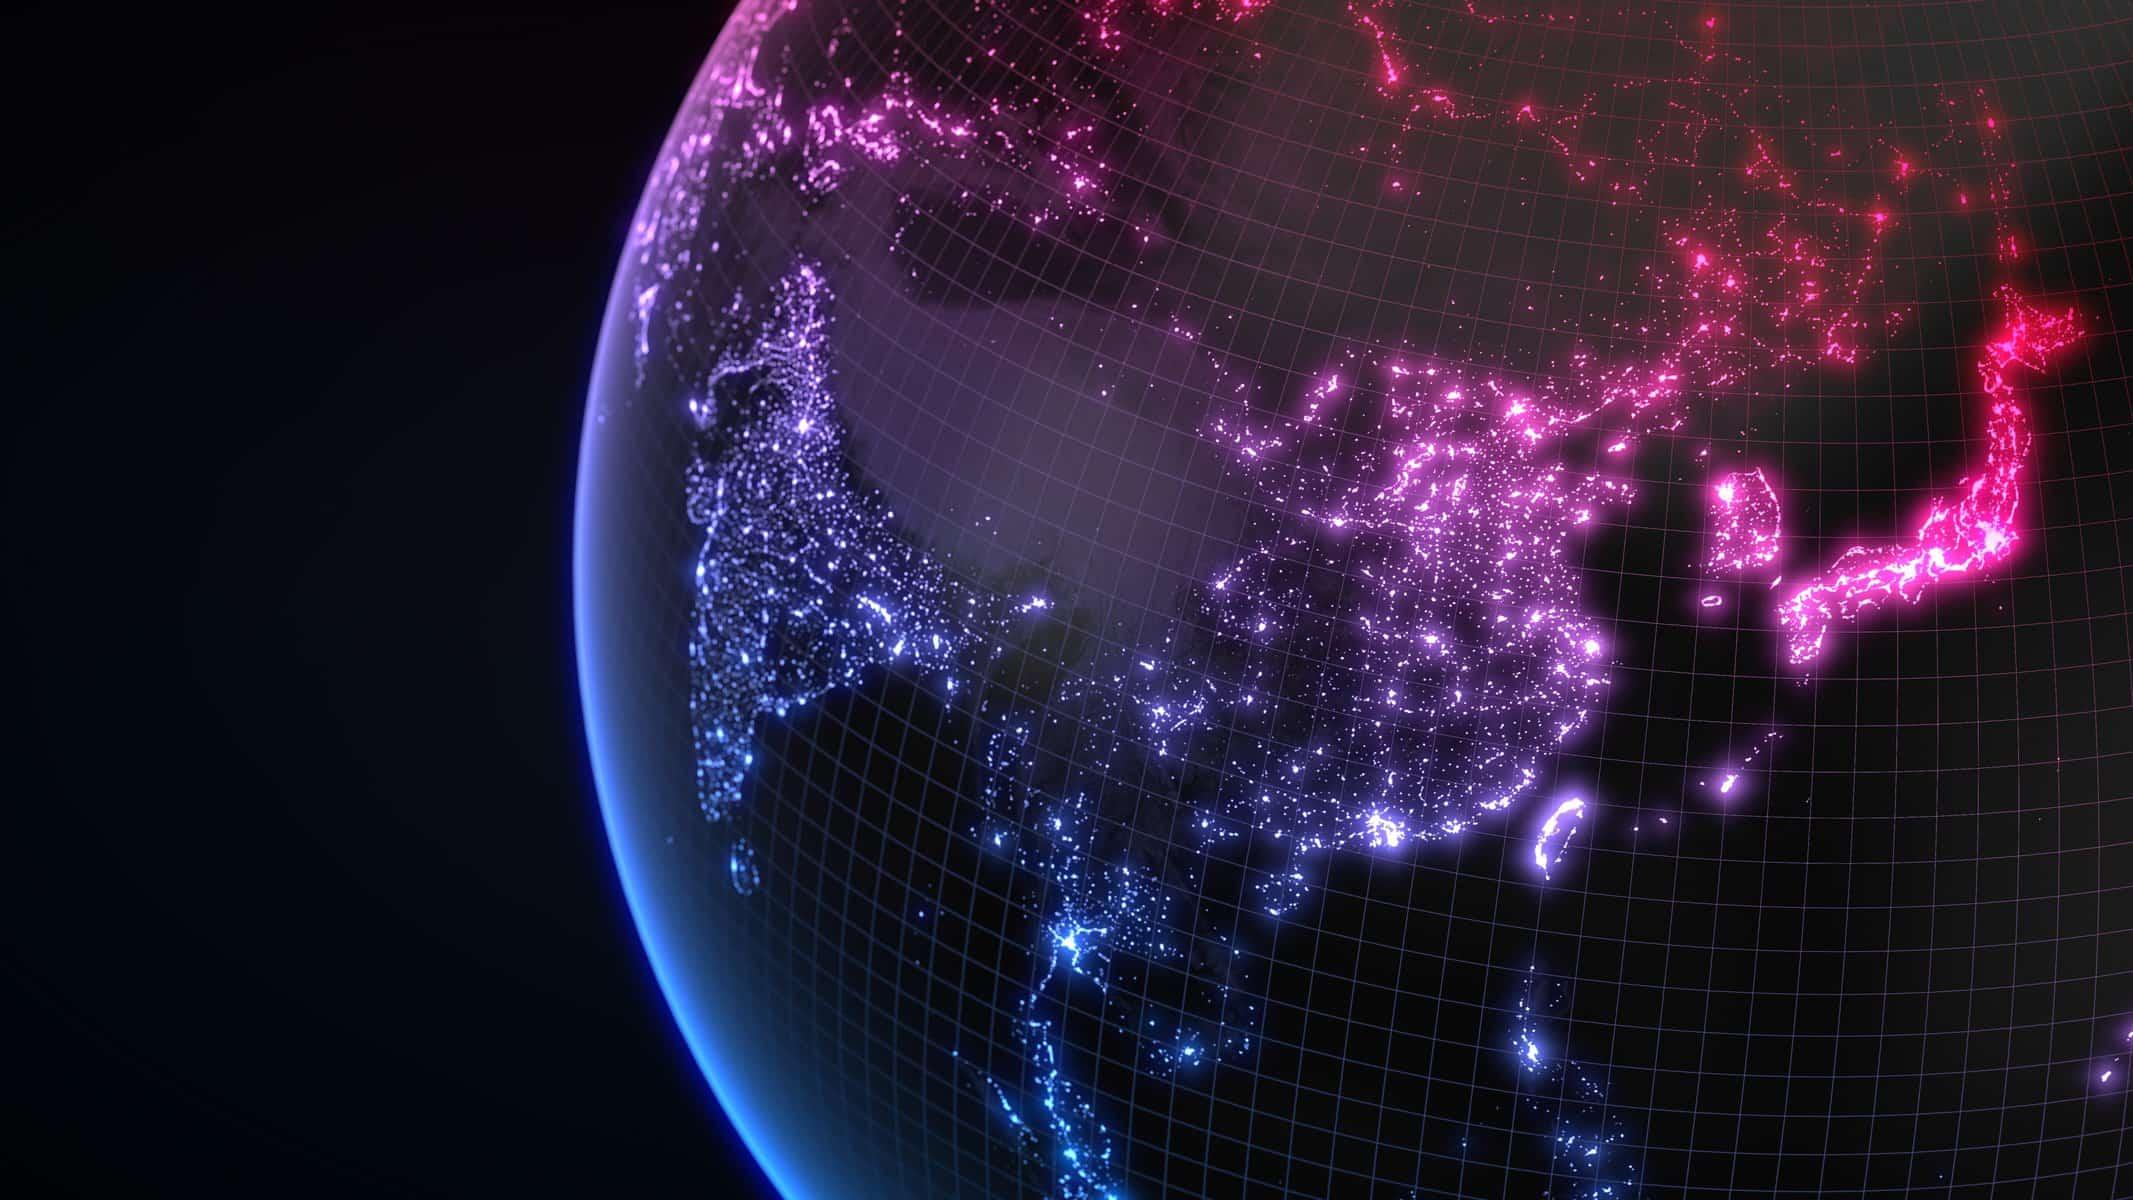 Elon Musk donates $10M to keep AI beneficial